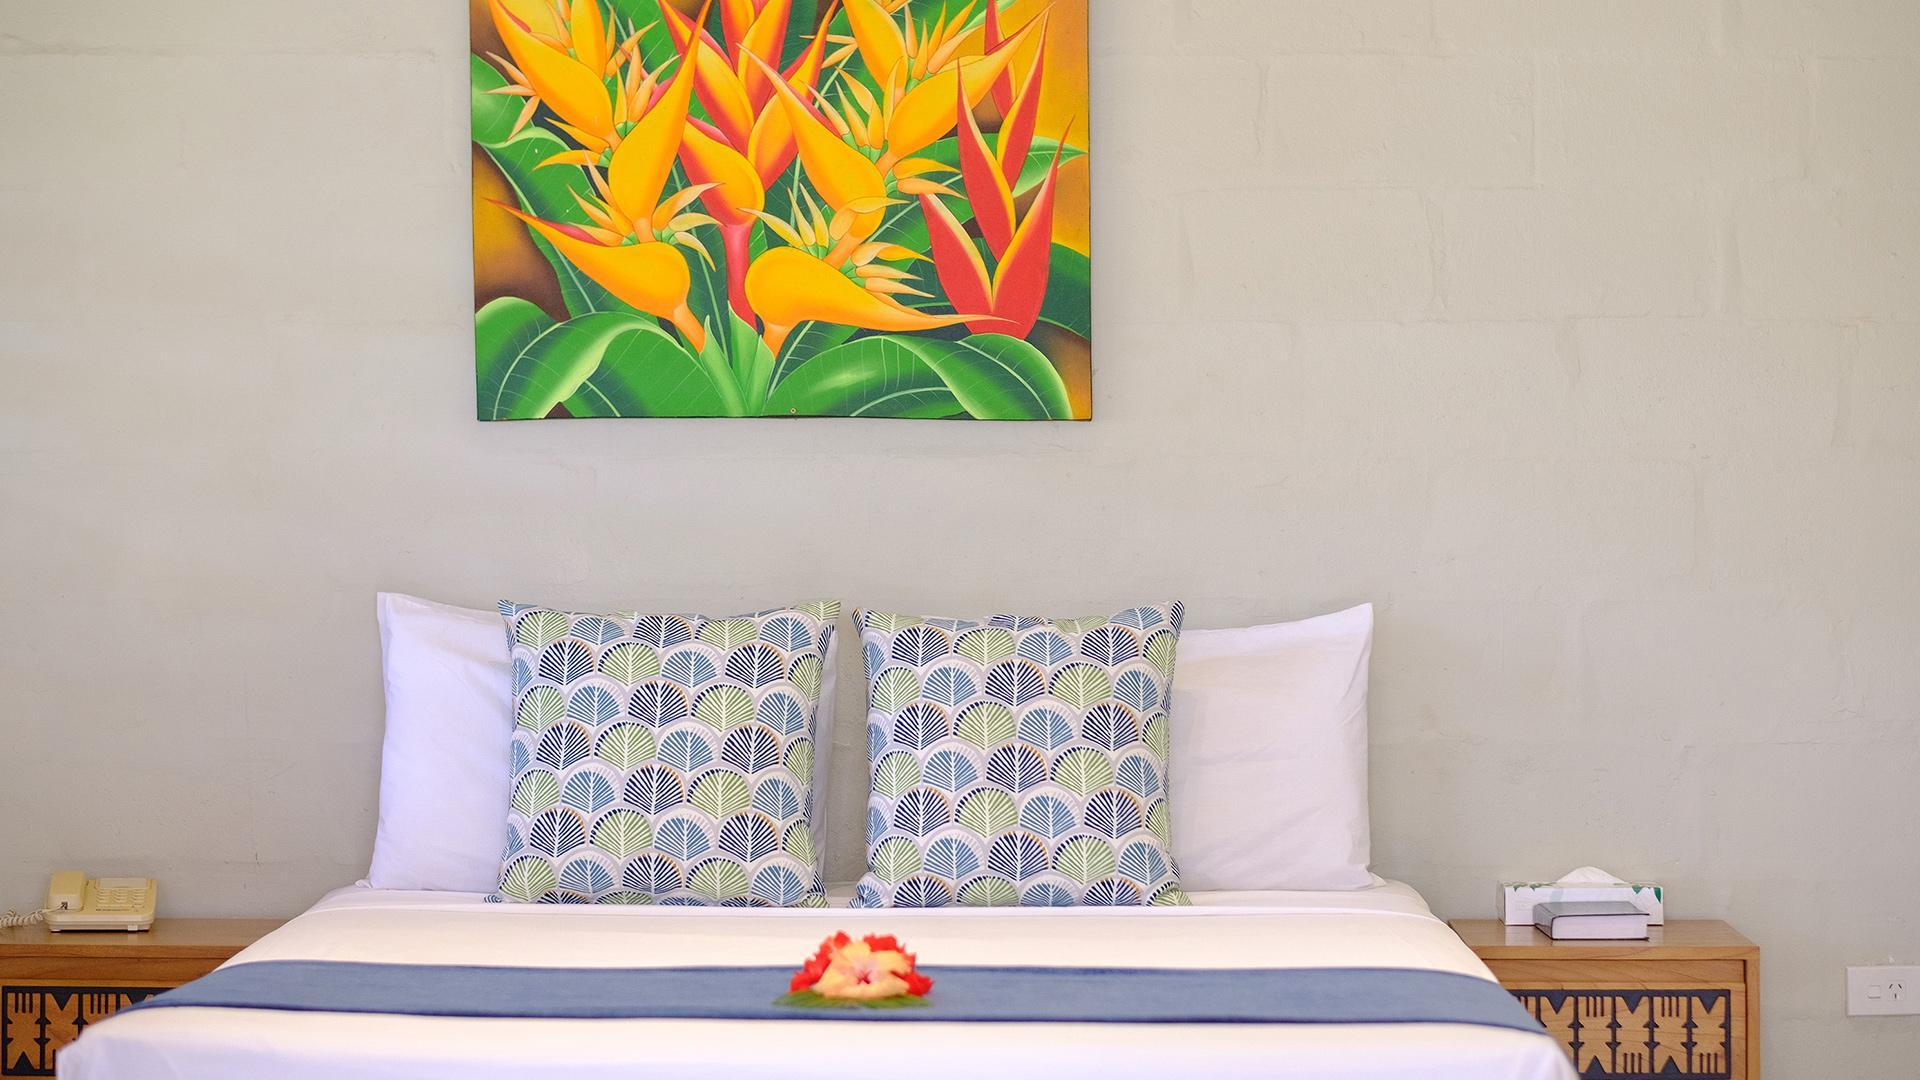 Studio Ocean Bure image 1 at Plantation Island Resort by null, Western Division, Fiji